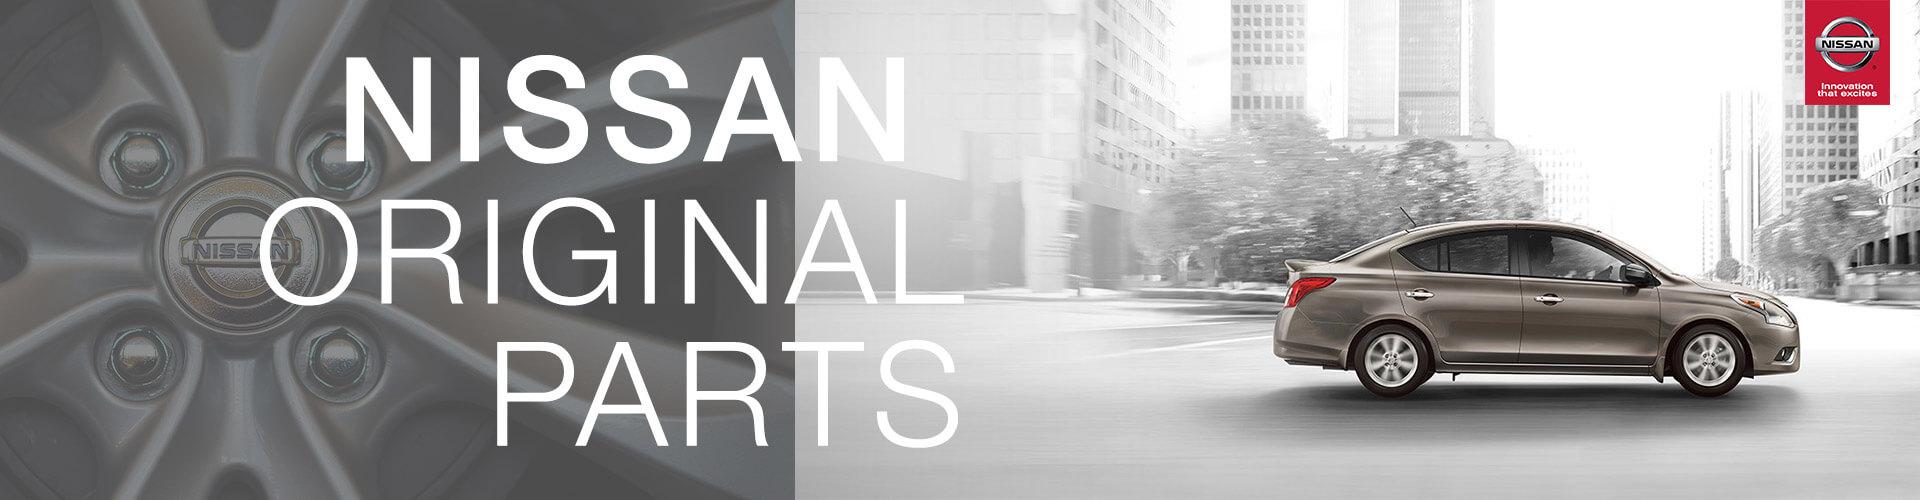 Nissan OEM Parts